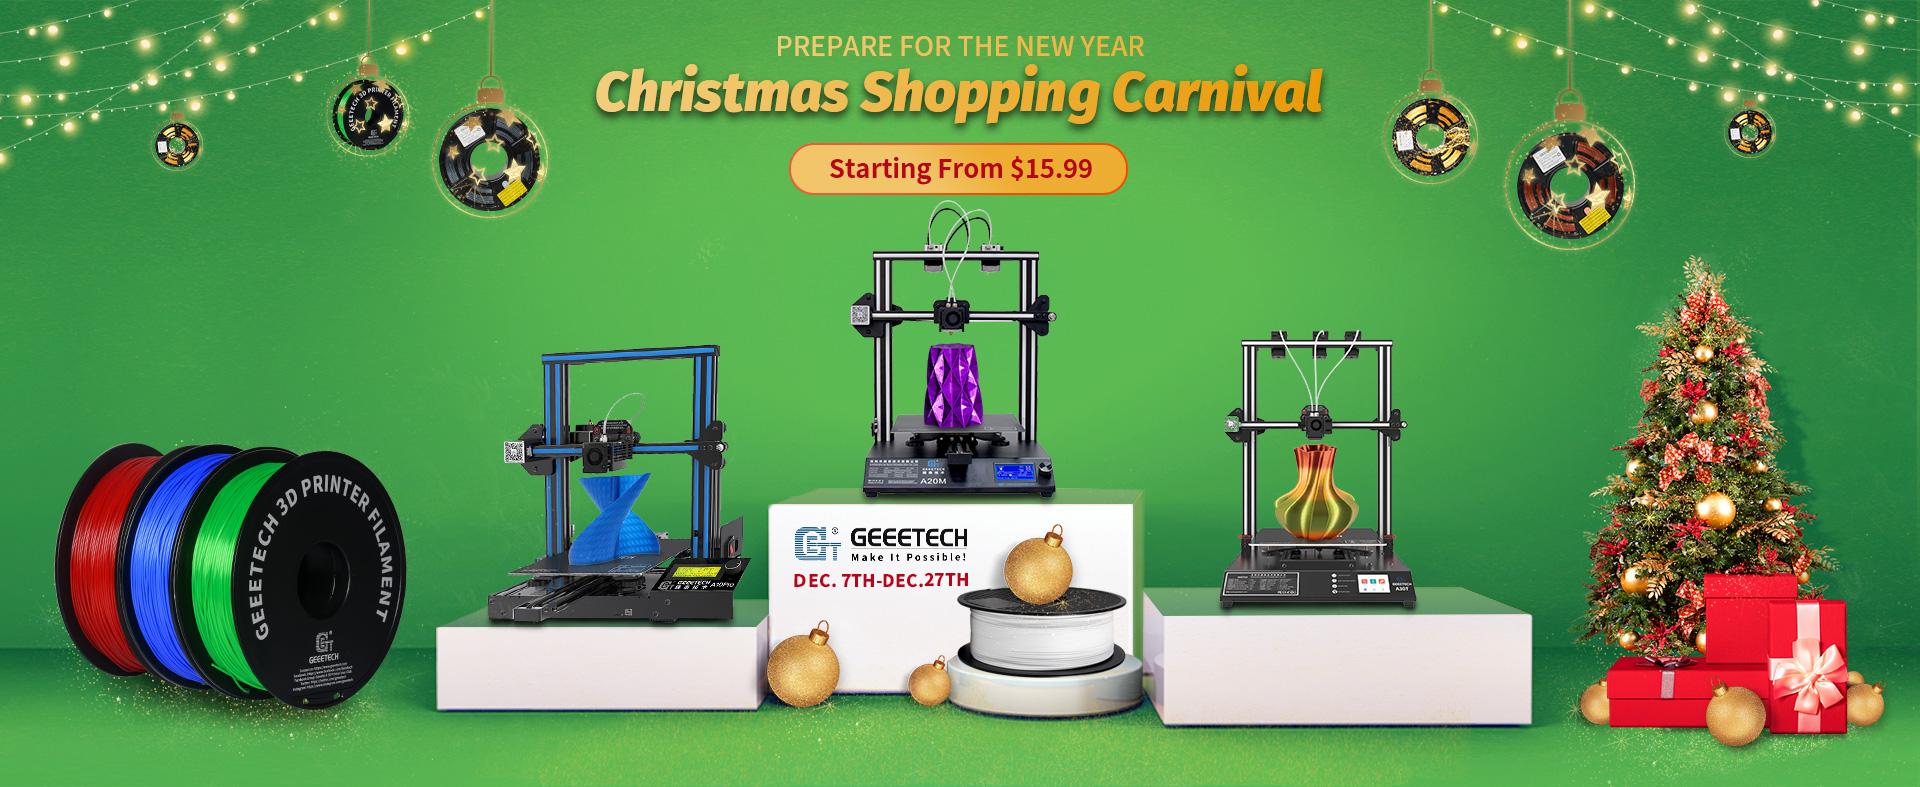 Geeetech's Christmas Shopping Carnival(Official web/Amazon/AliExpress)